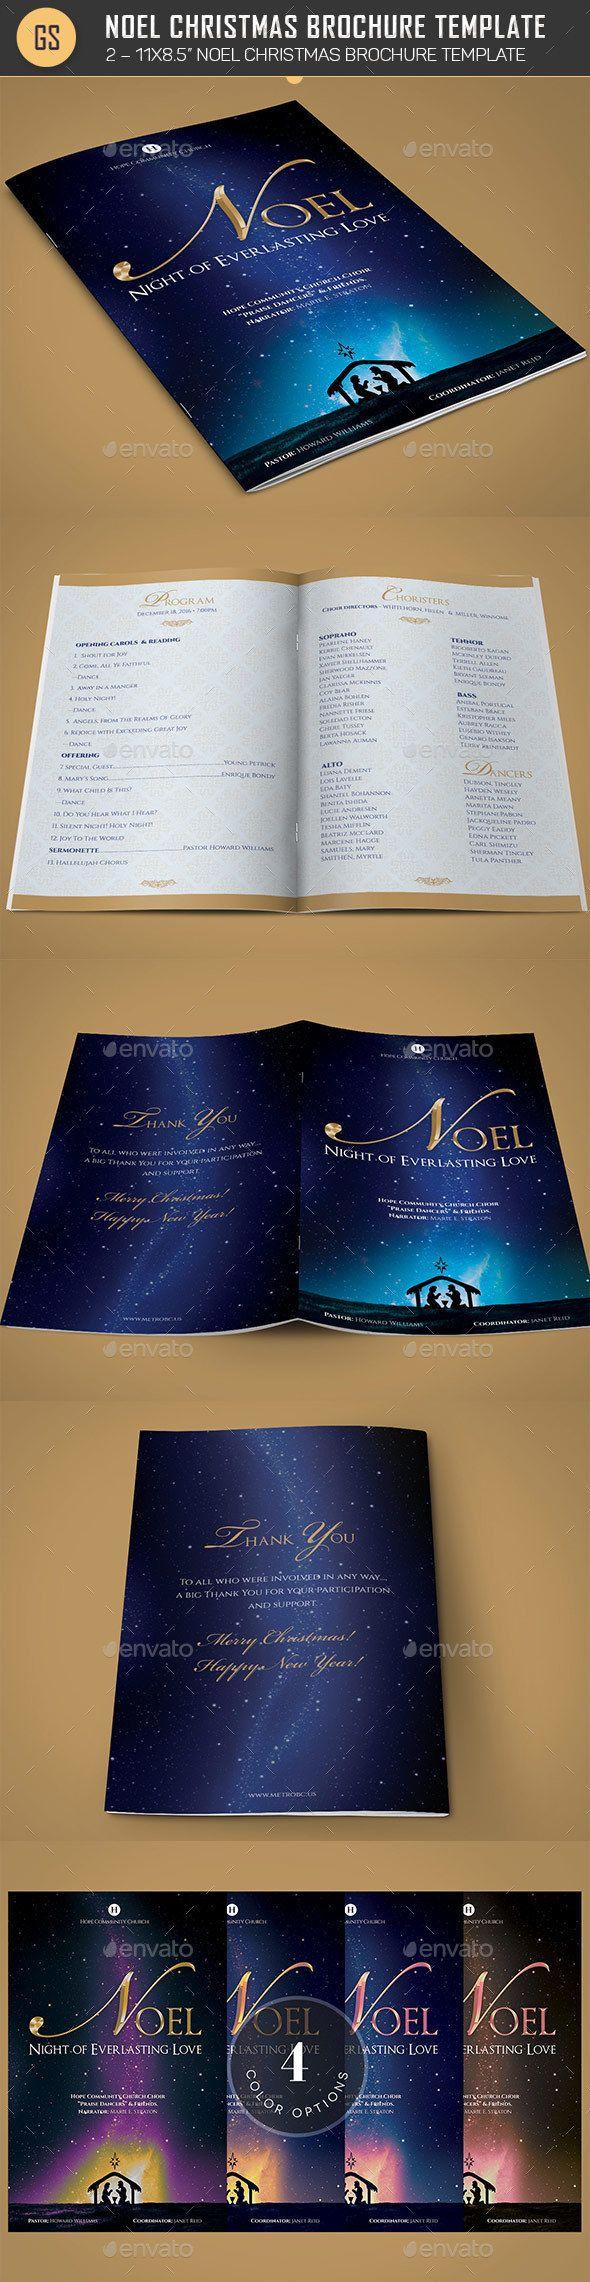 Noel Christmas Brochure Template - Informational Brochures